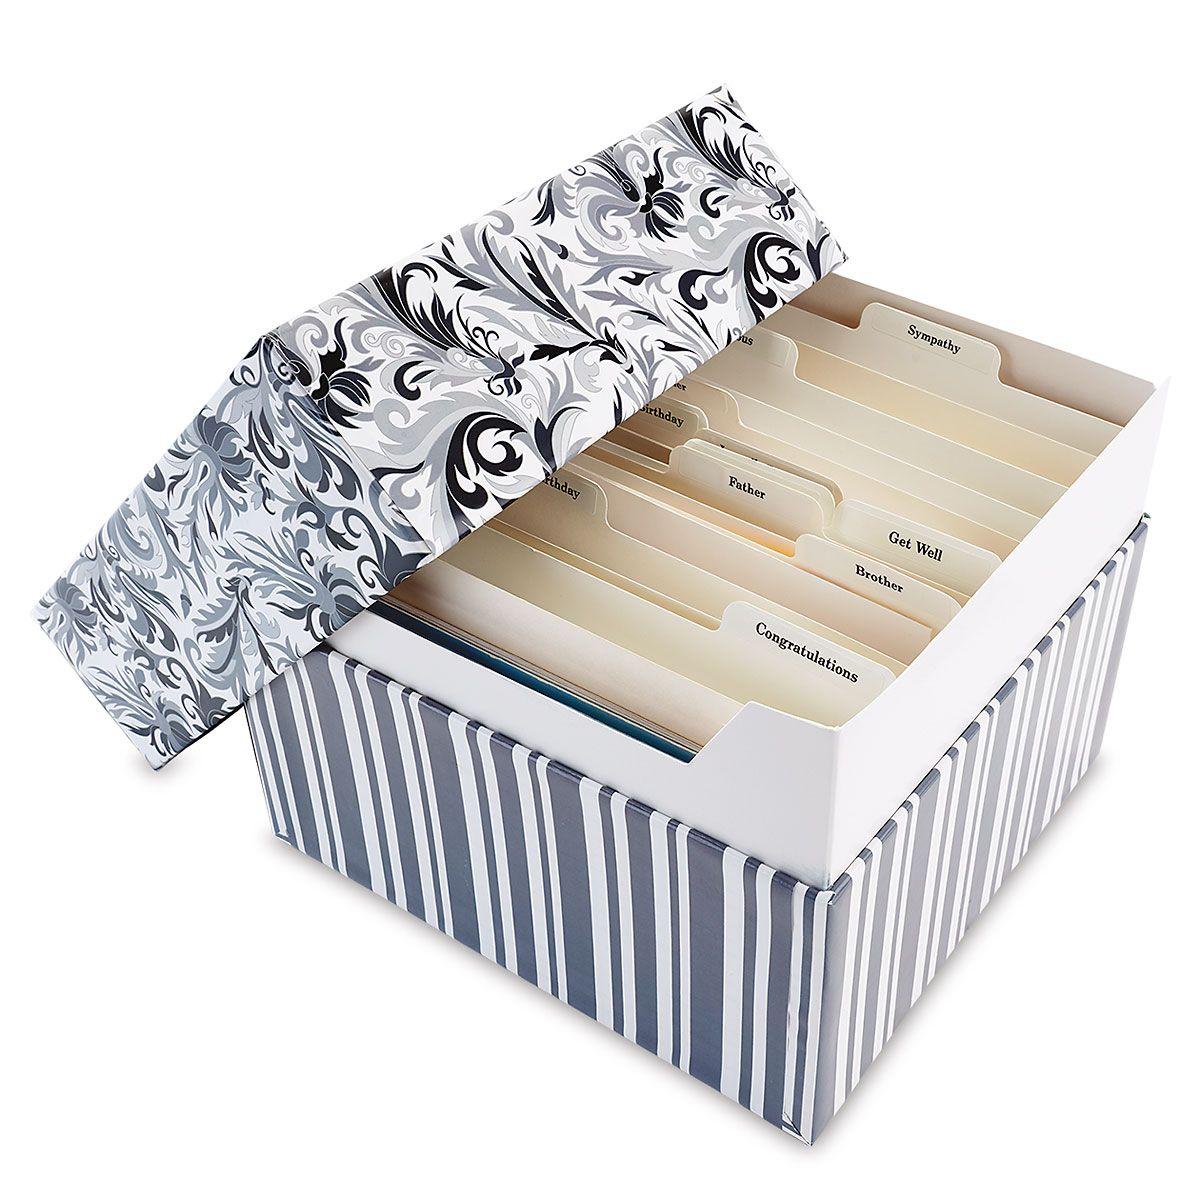 Black Elegance Greeting Card Organizer Box and Labels